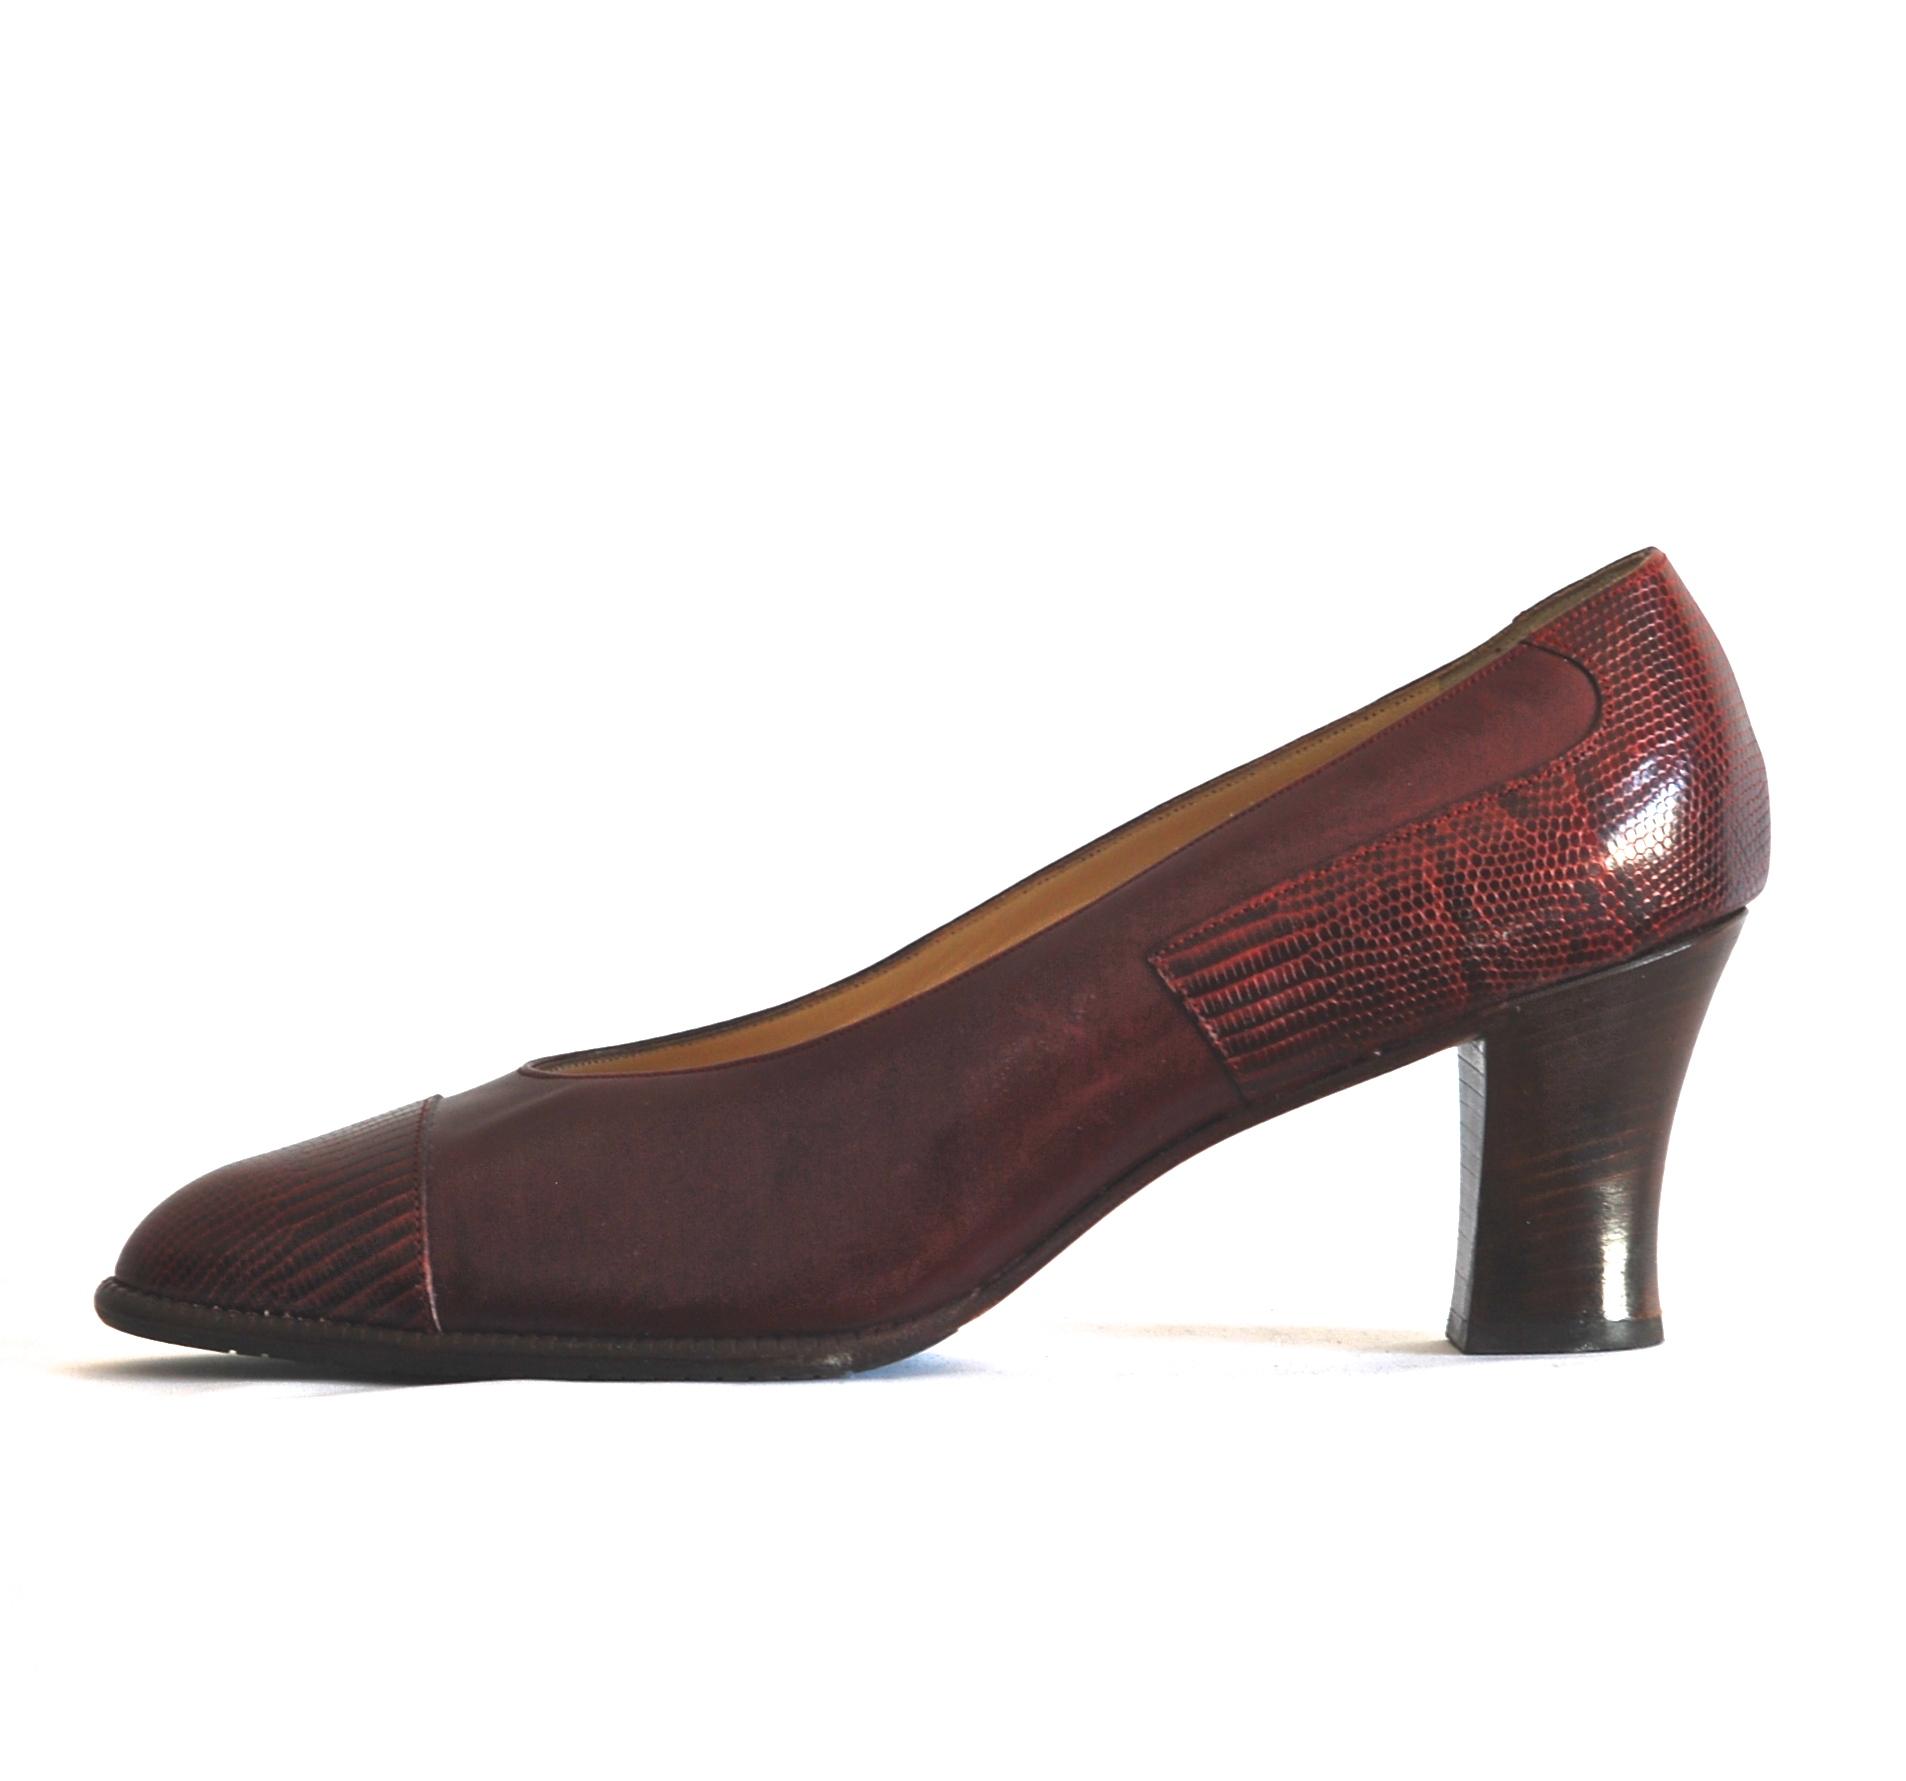 6b63852f75b9e Bally 1980's Burgundy Leather Shoes - Switzerland